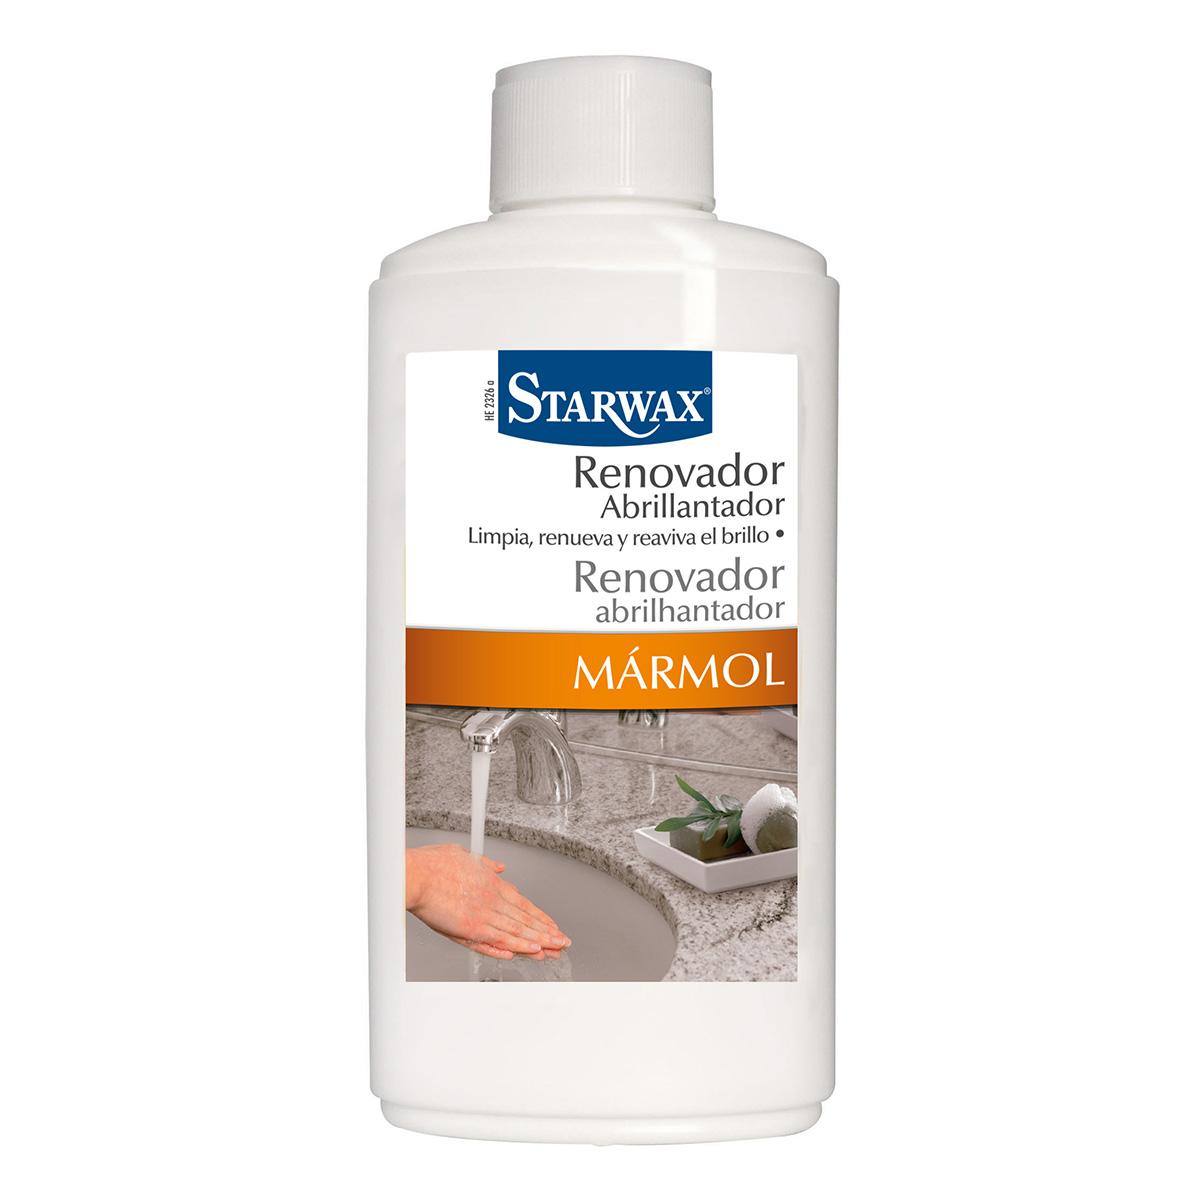 Renovador abrillantador marmol - Starwax